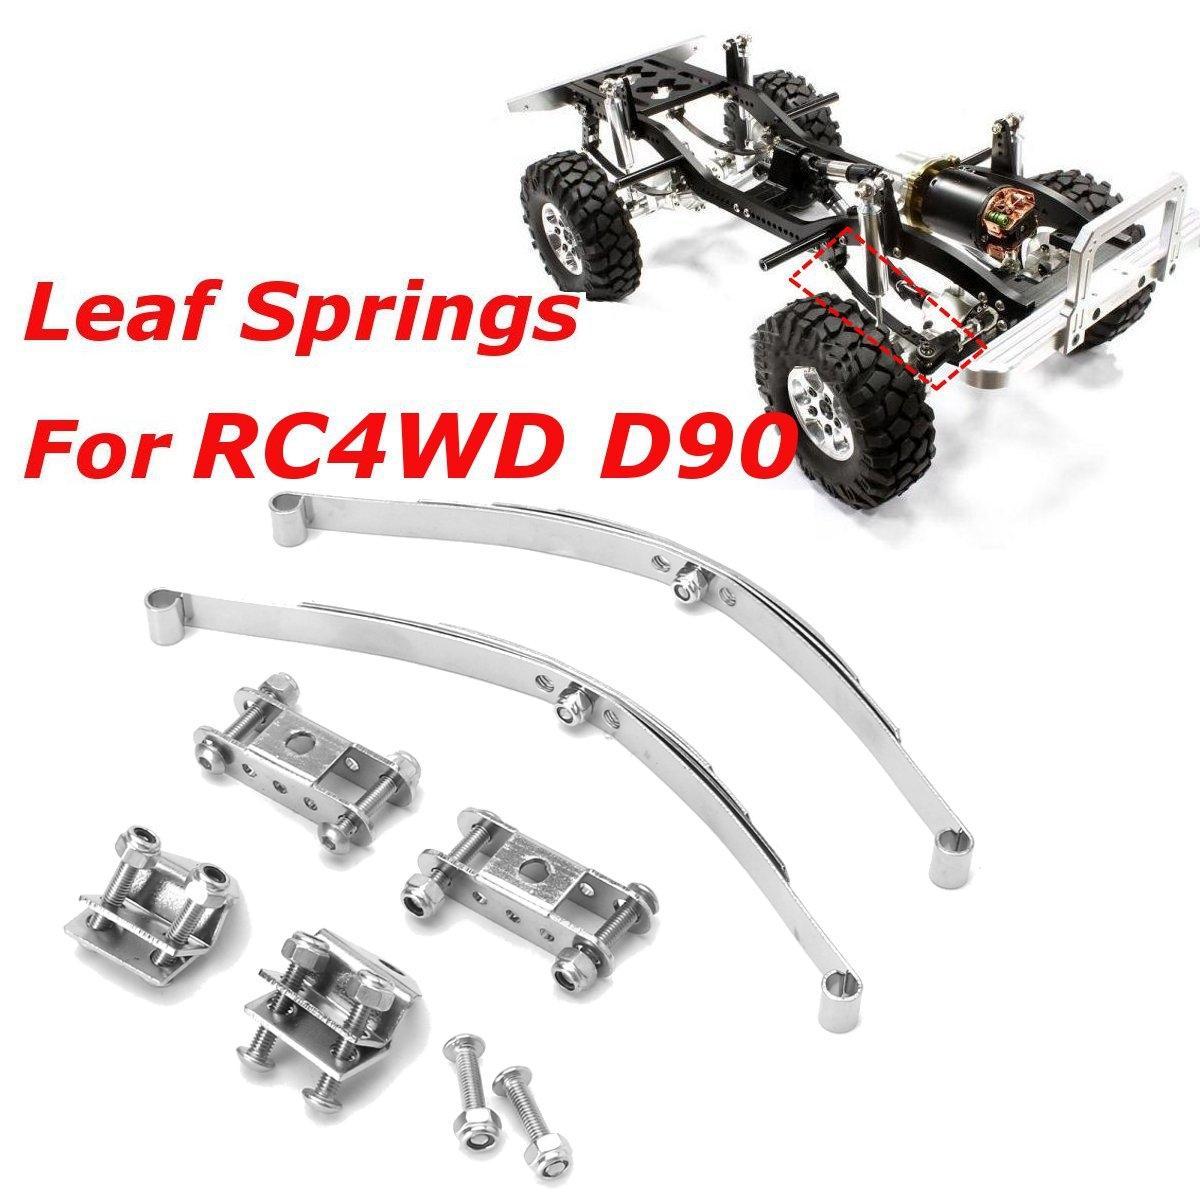 1/10 Leaf Springs Set HighLift Chassis For D90 RC Crawler Car ...